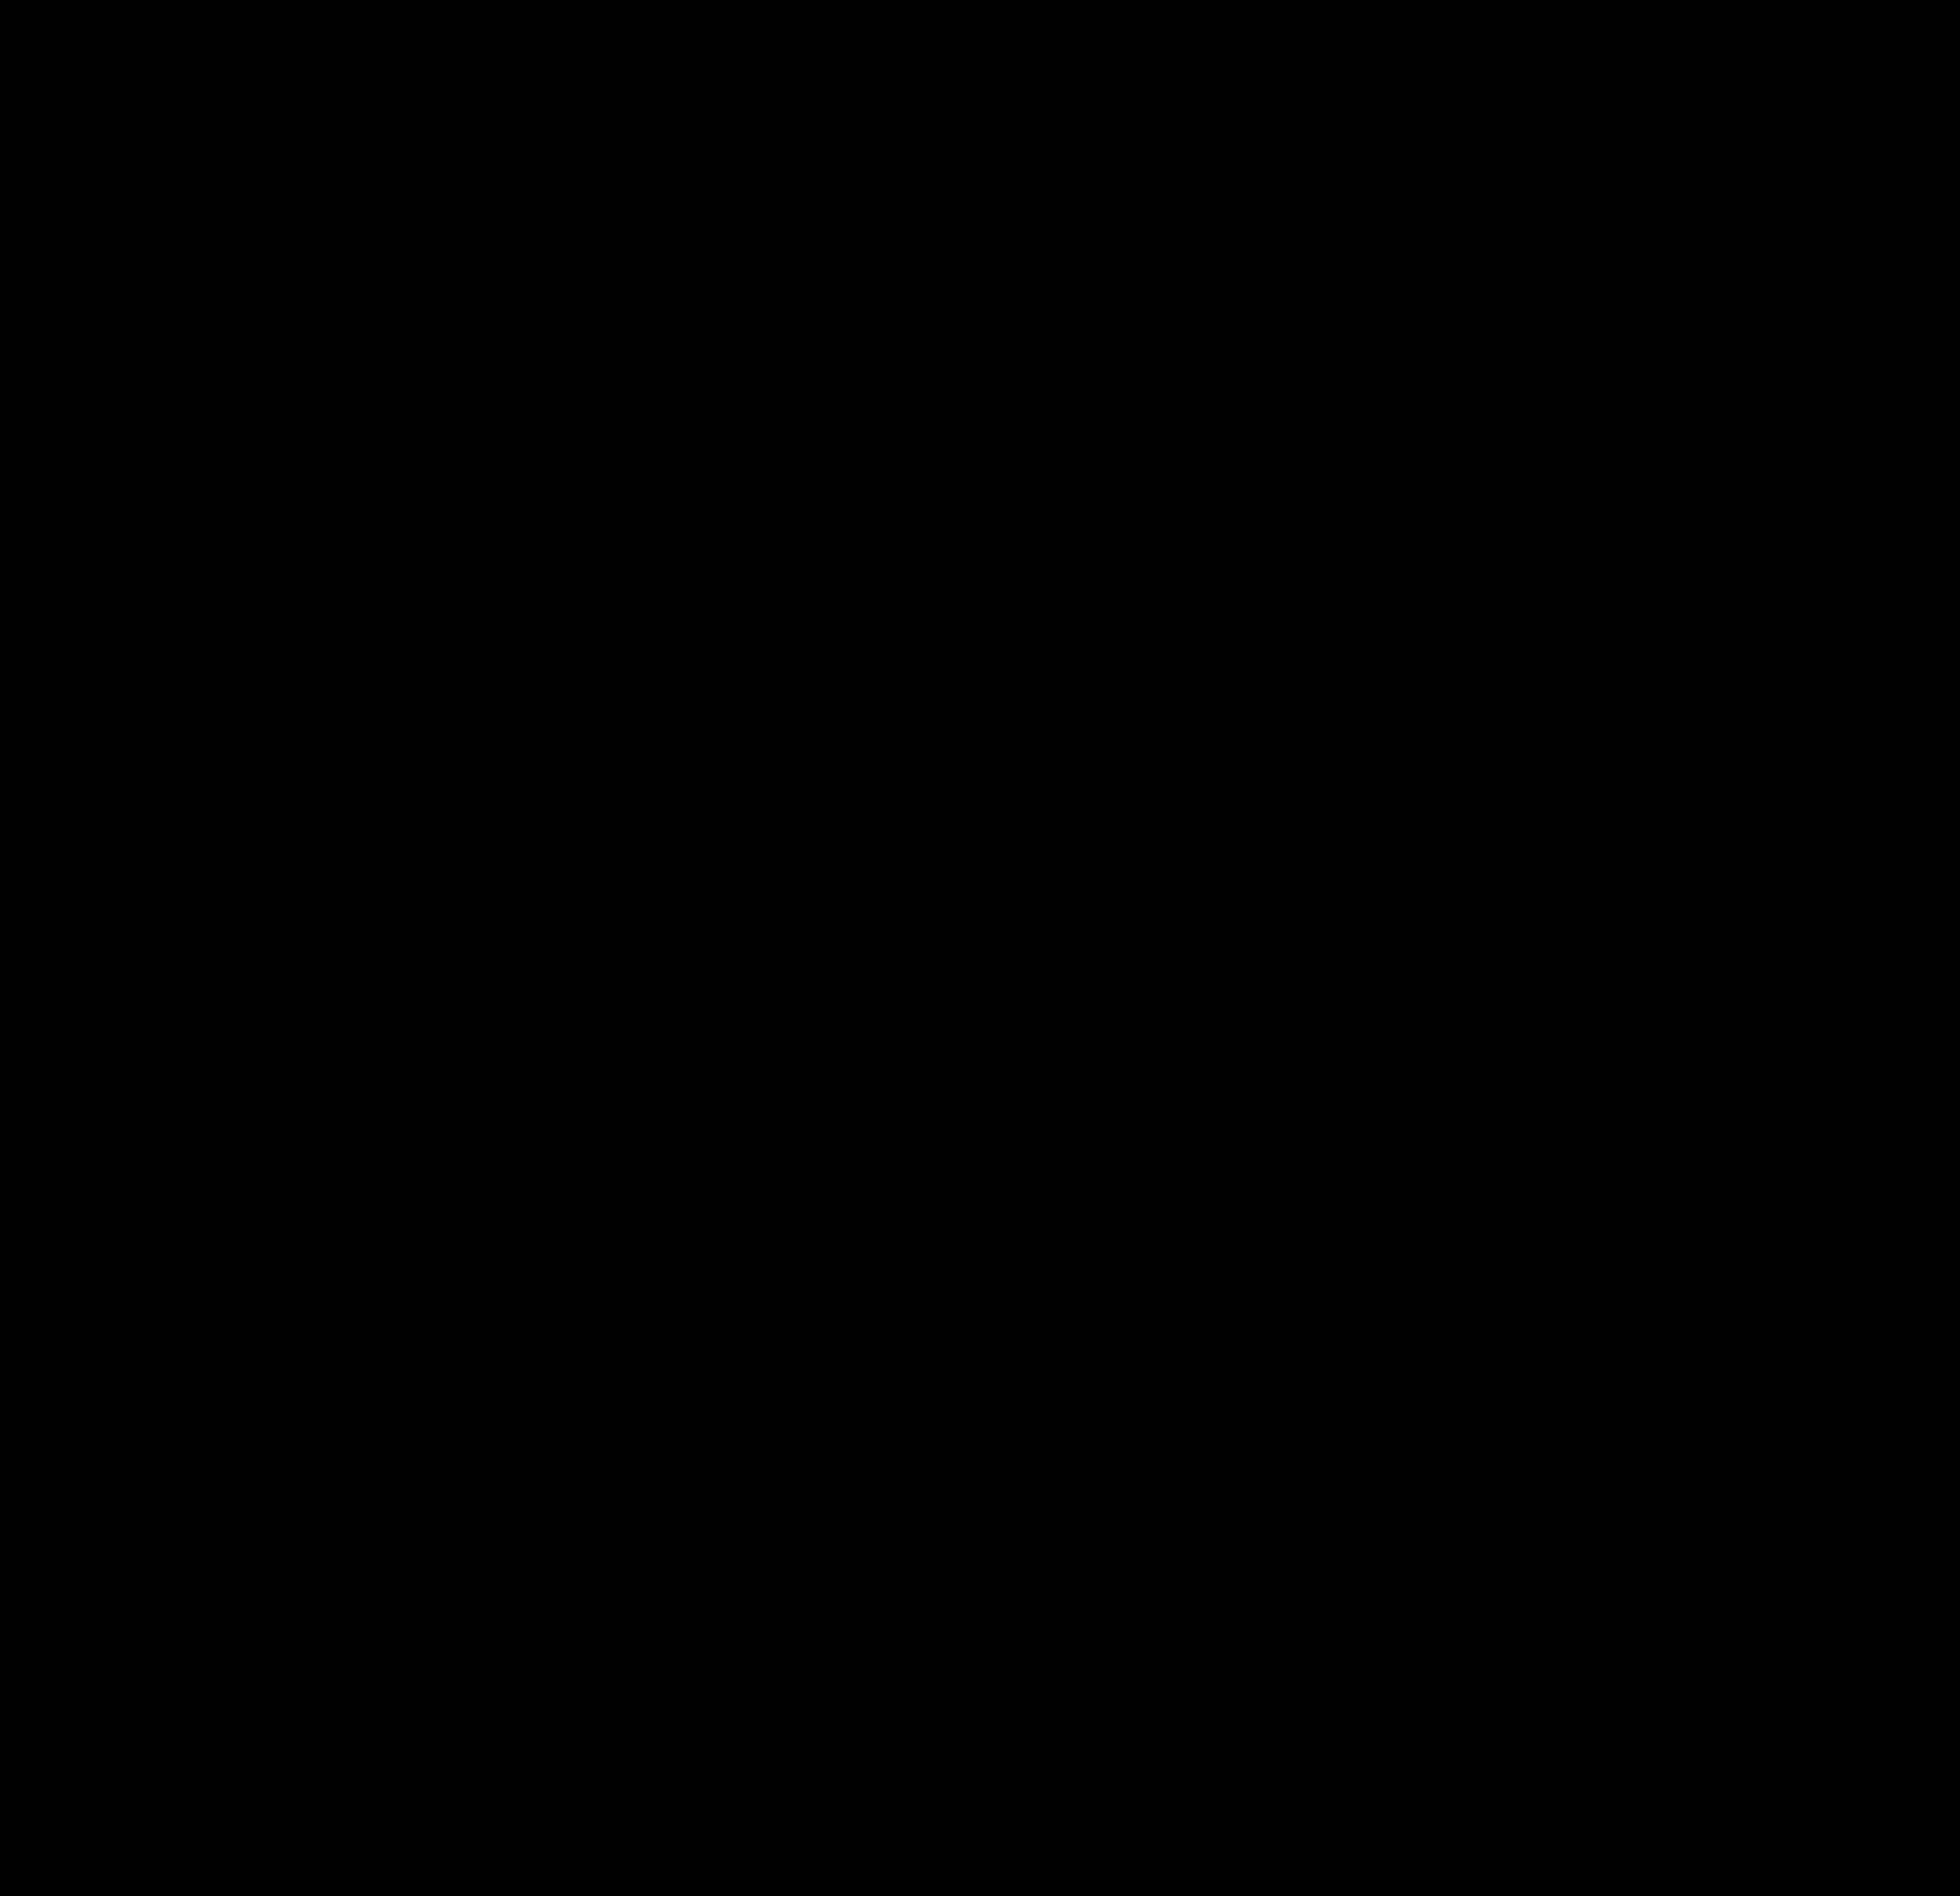 Math symbols pi choice. Multiplication clipart mathematics wallpaper